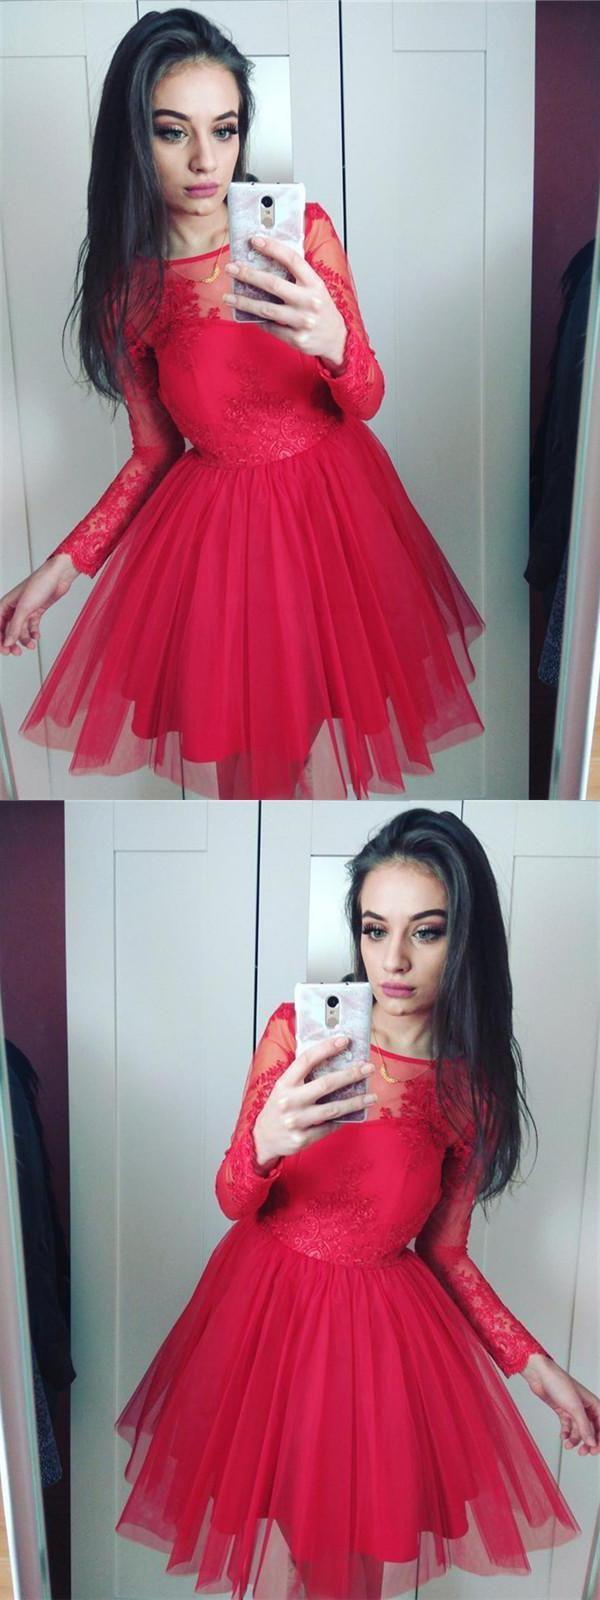 Aline homecoming dress shortmini prom drsess juniors homecoming